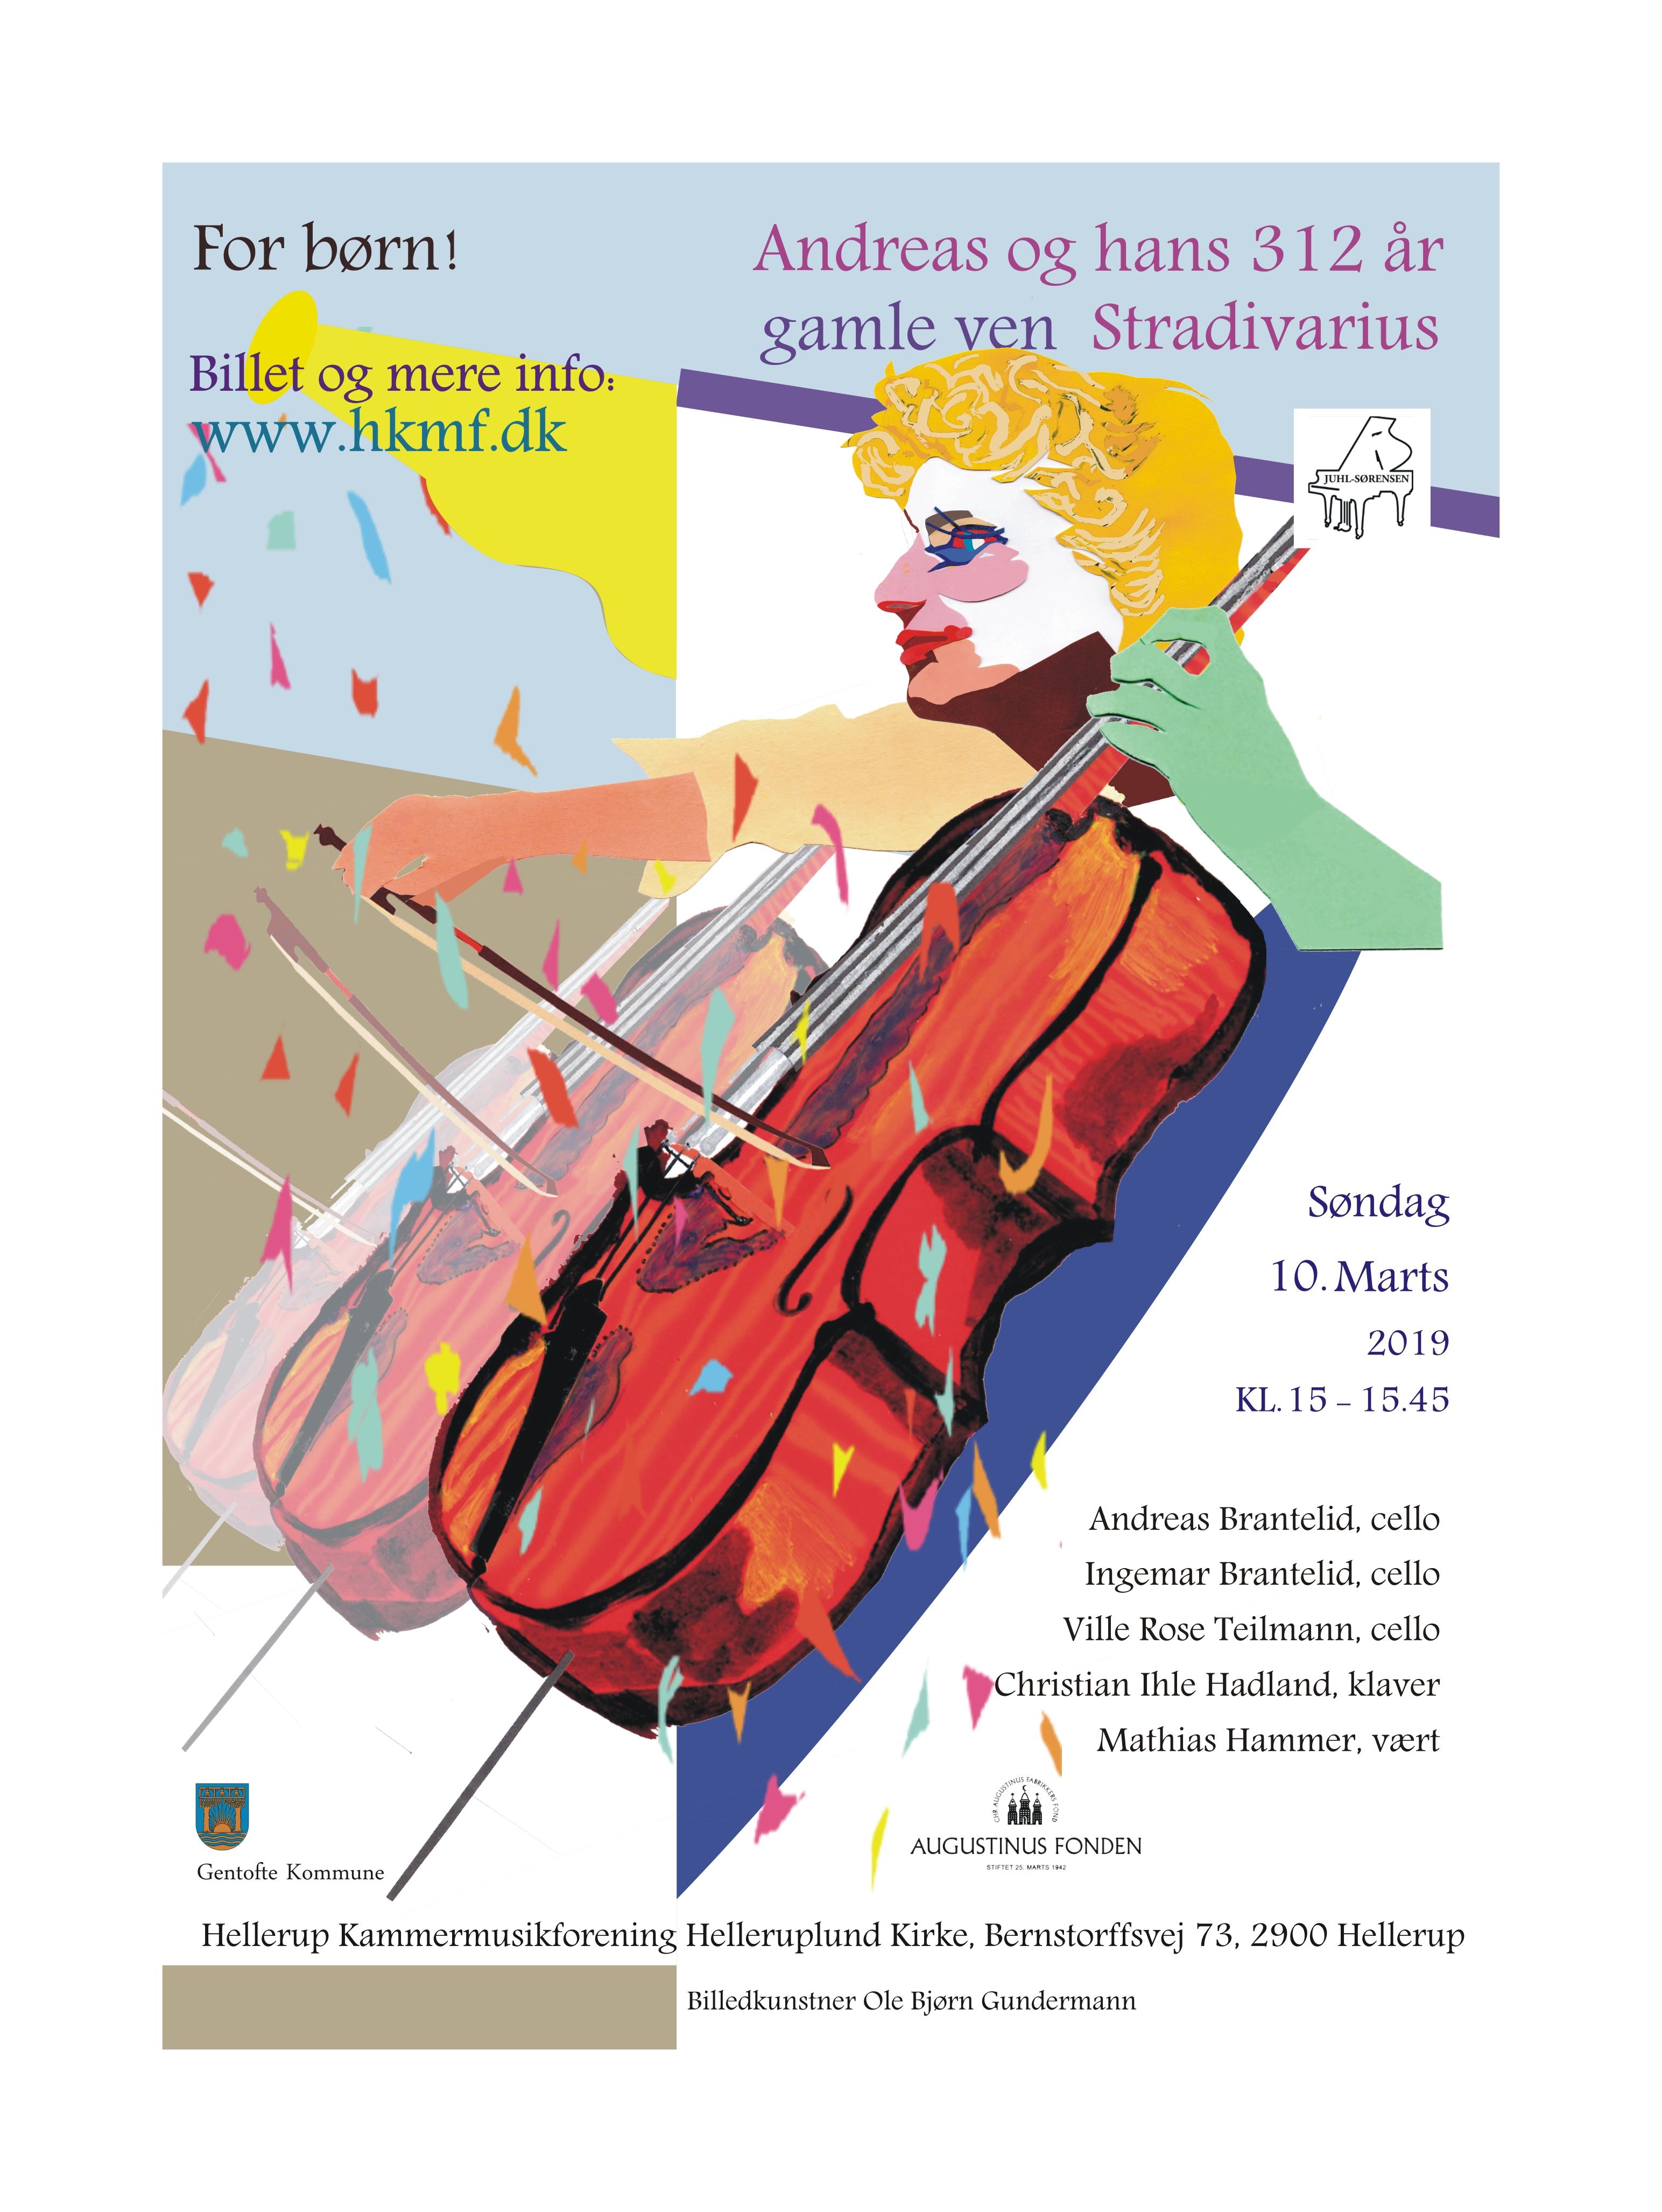 HKMF-Stradivarius